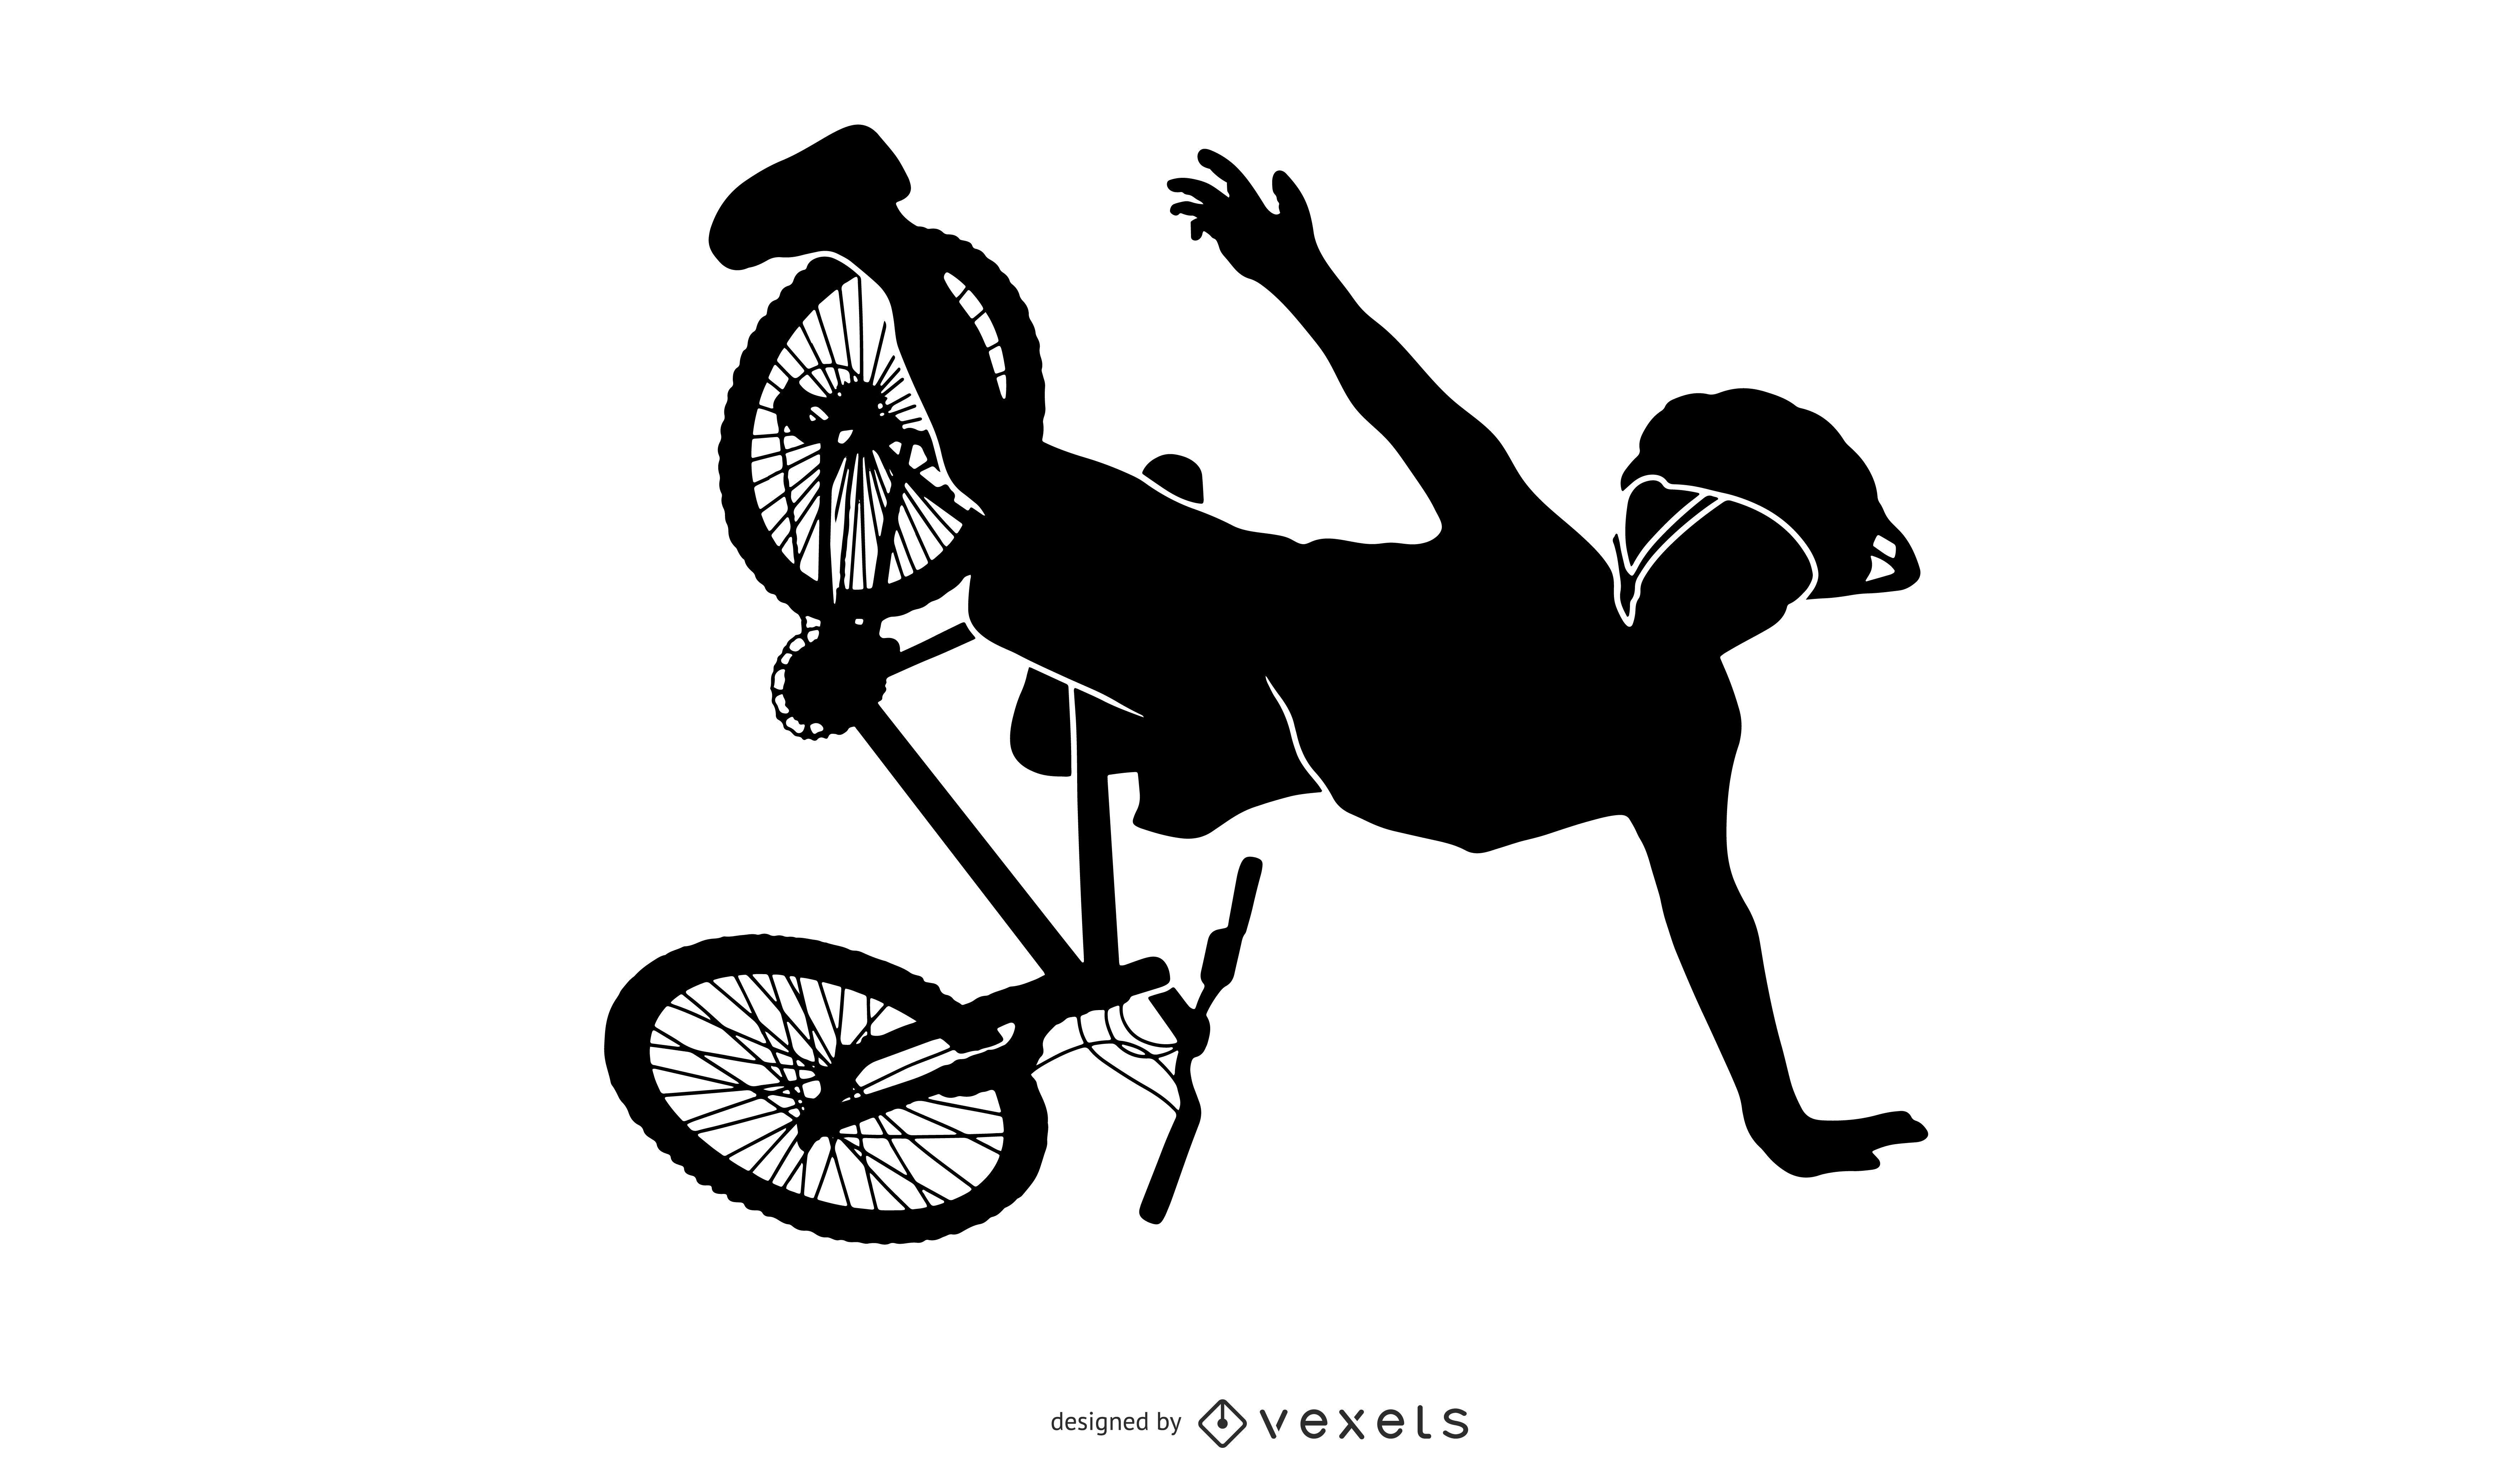 Biker falling silhouette design